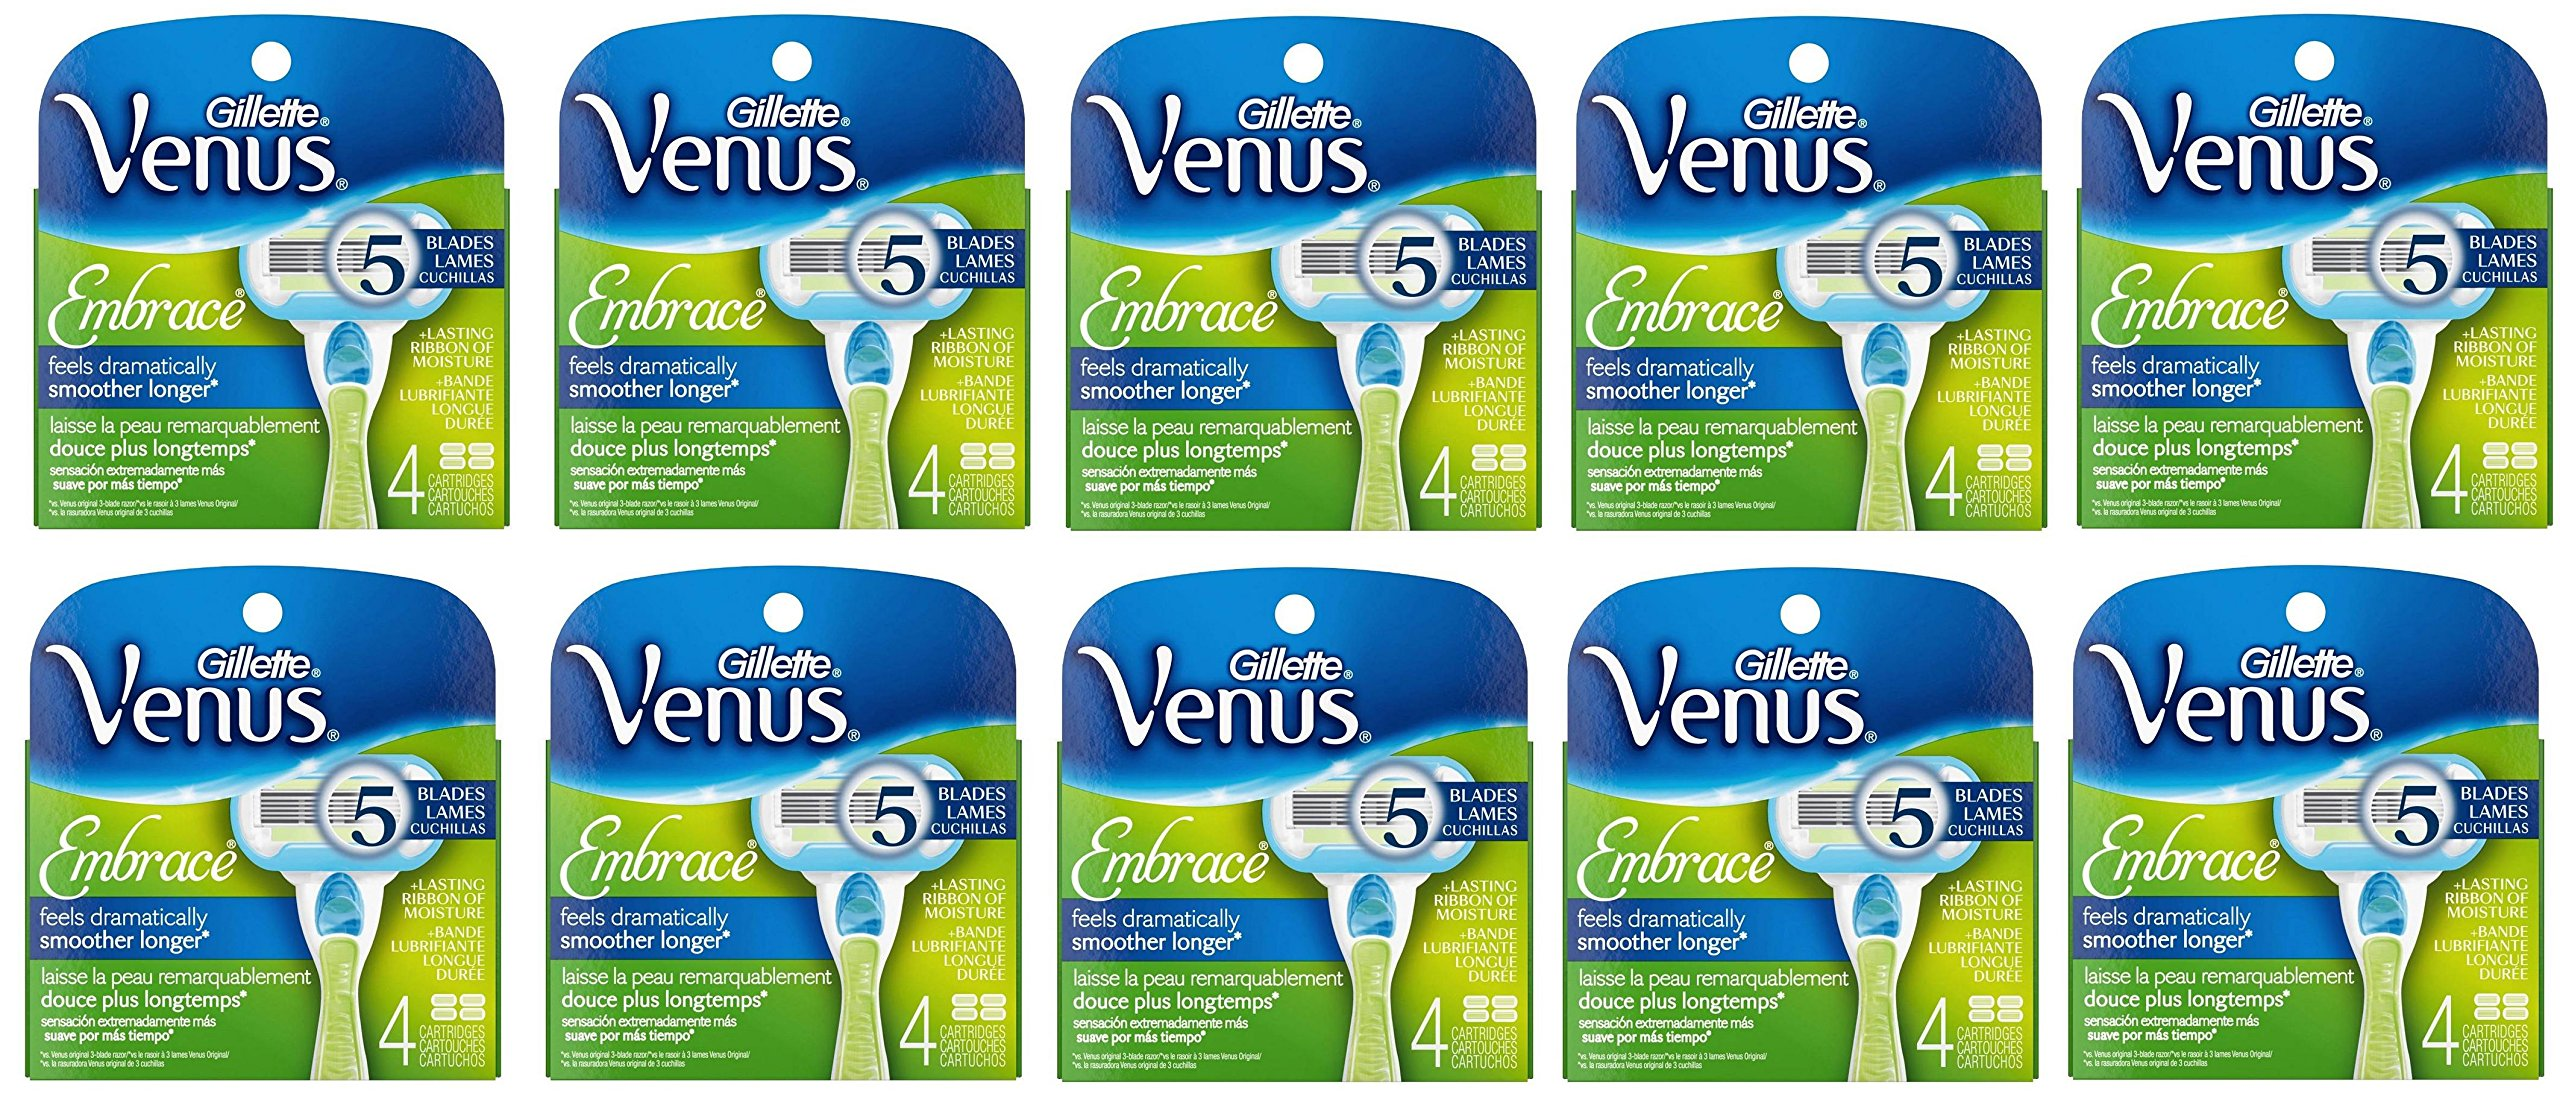 Gillette Venus Embrace Womens Razor Blade Refills BhXIISr, 10Pack (4 Count)